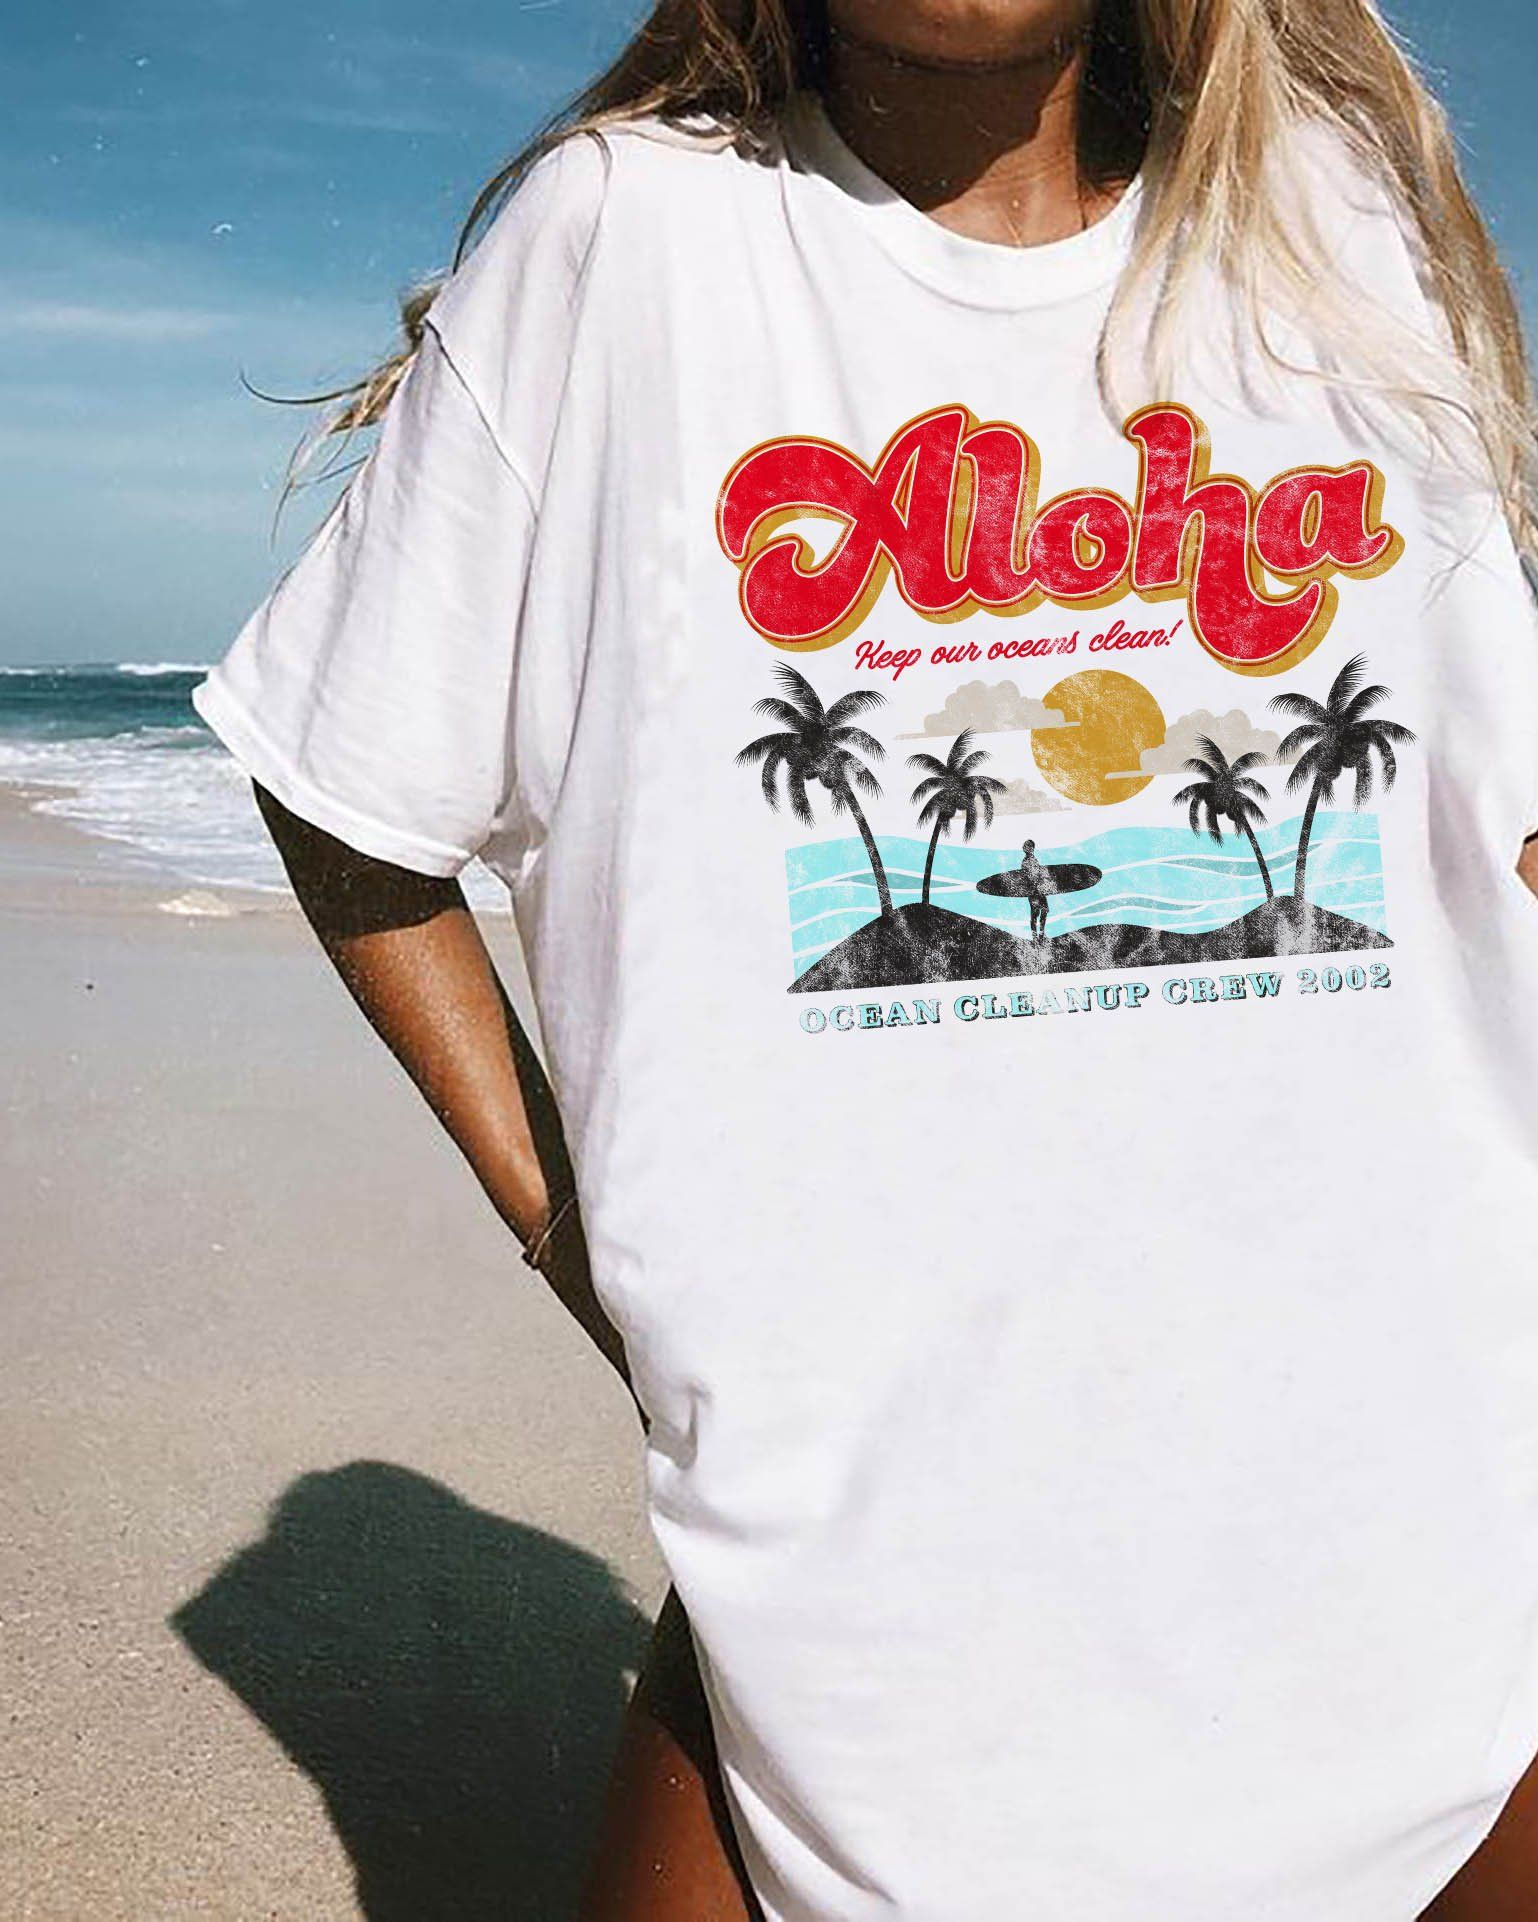 5a2a532369e52 Aloha Tee l Heartman l  38.00 l T-Shirt